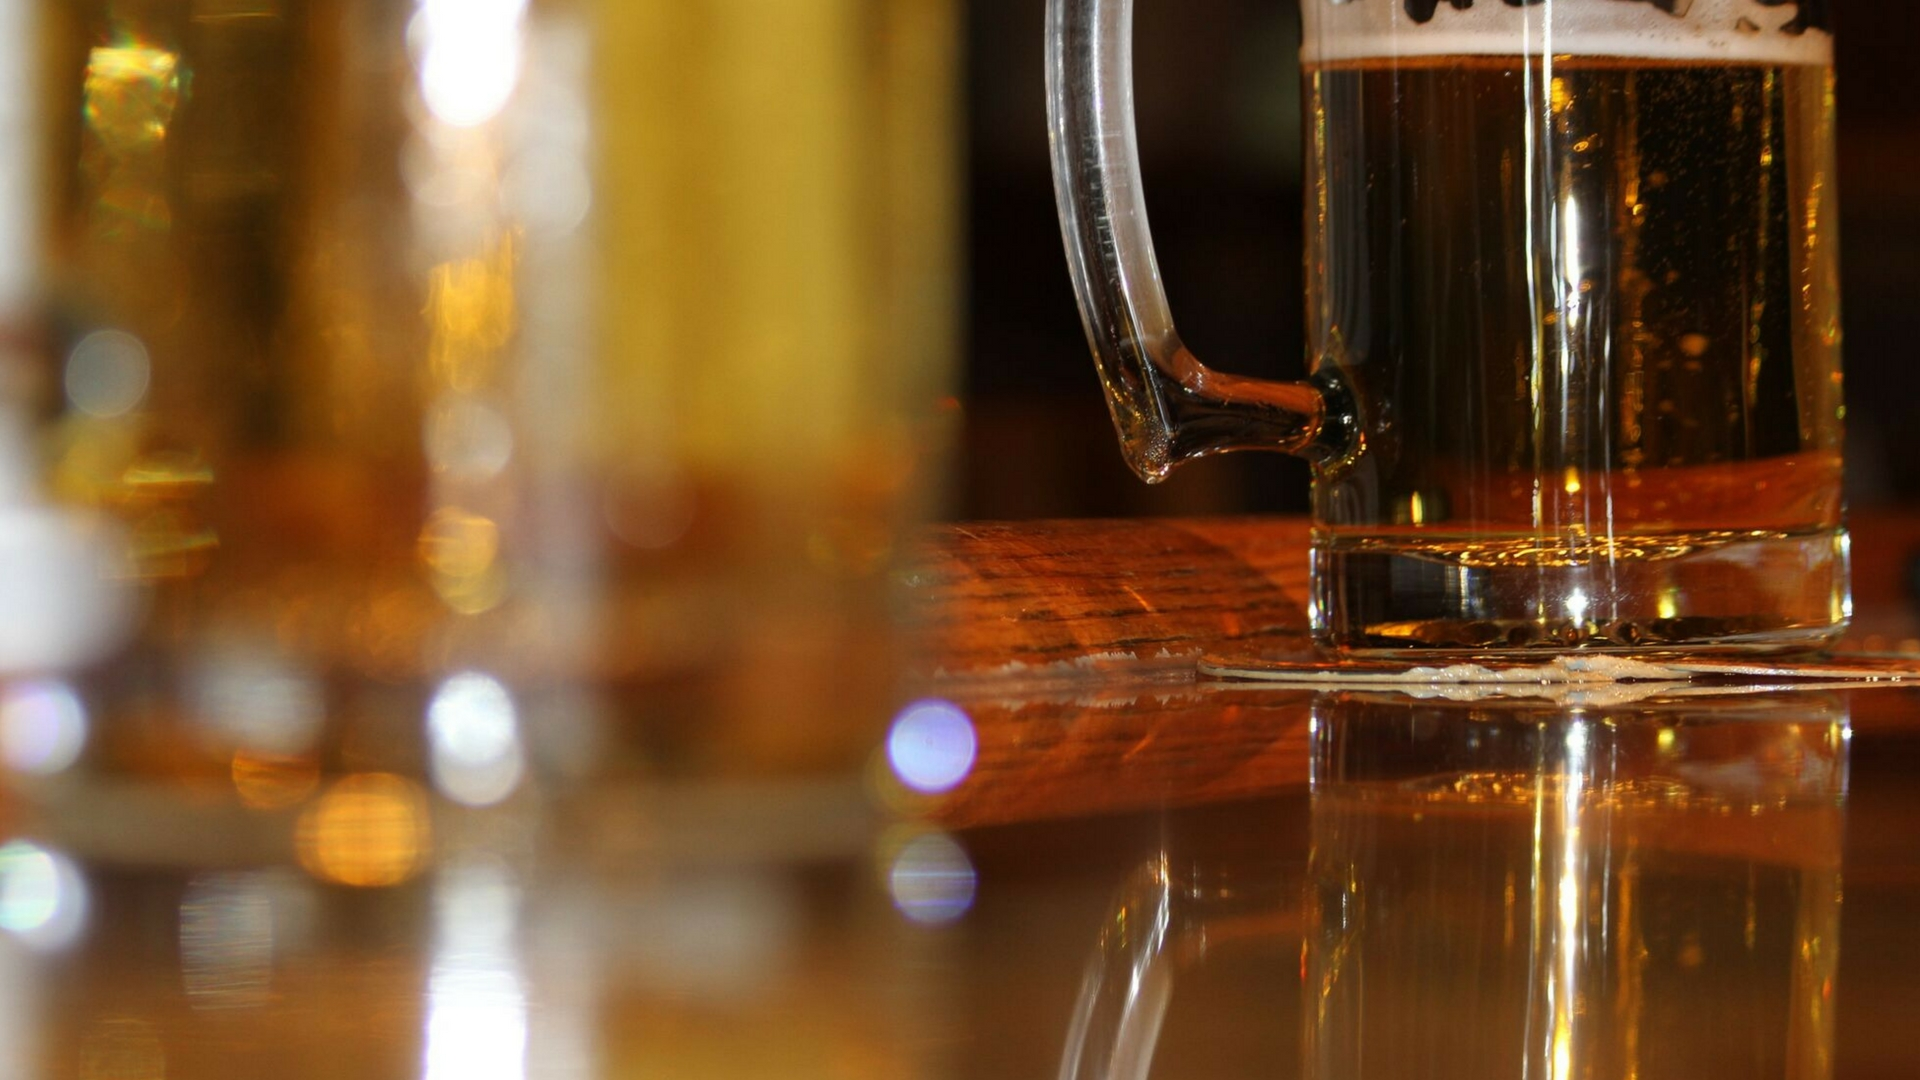 Cerveza, la bebida fria mas consumida en hosteleria 1920